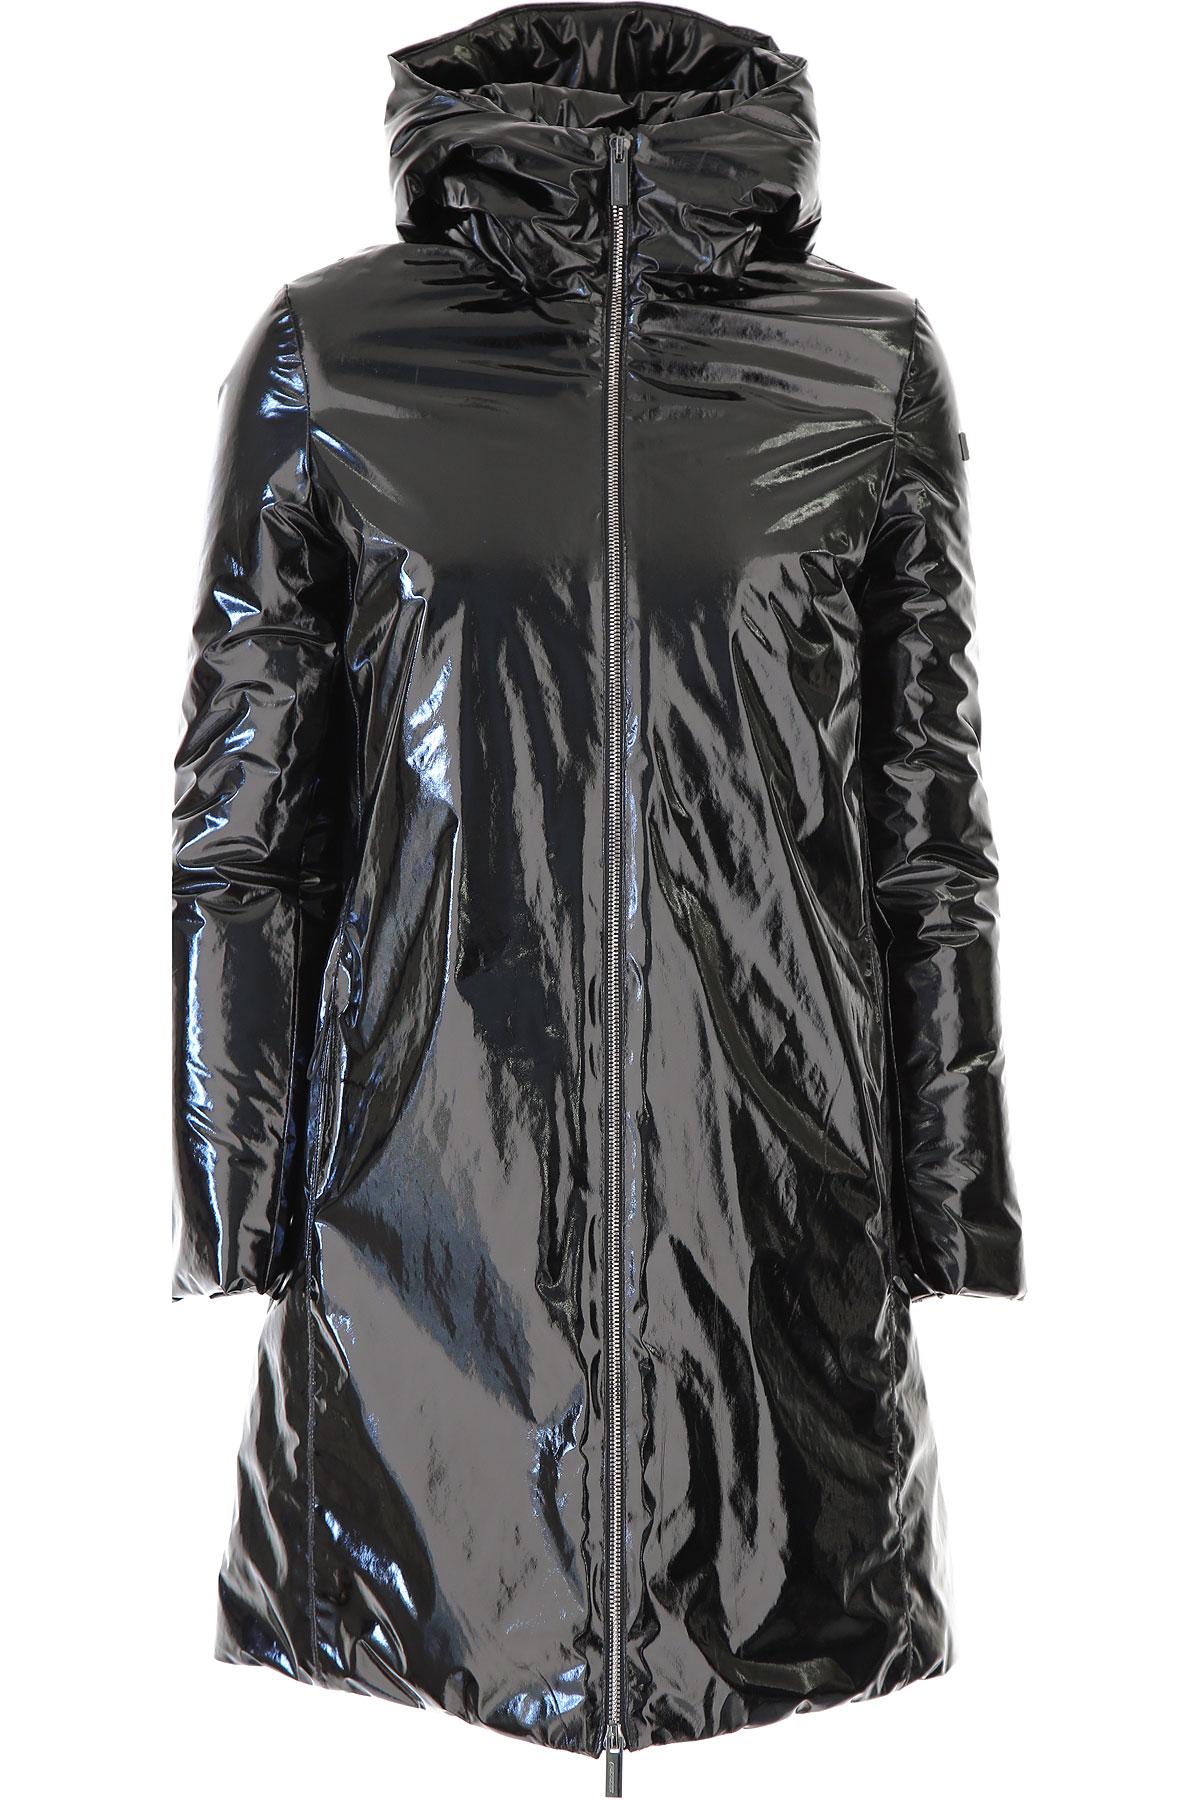 RRD Down Jacket for Women, Puffer Ski Jacket On Sale, Black, polyestere, 2019, 10 4 6 8